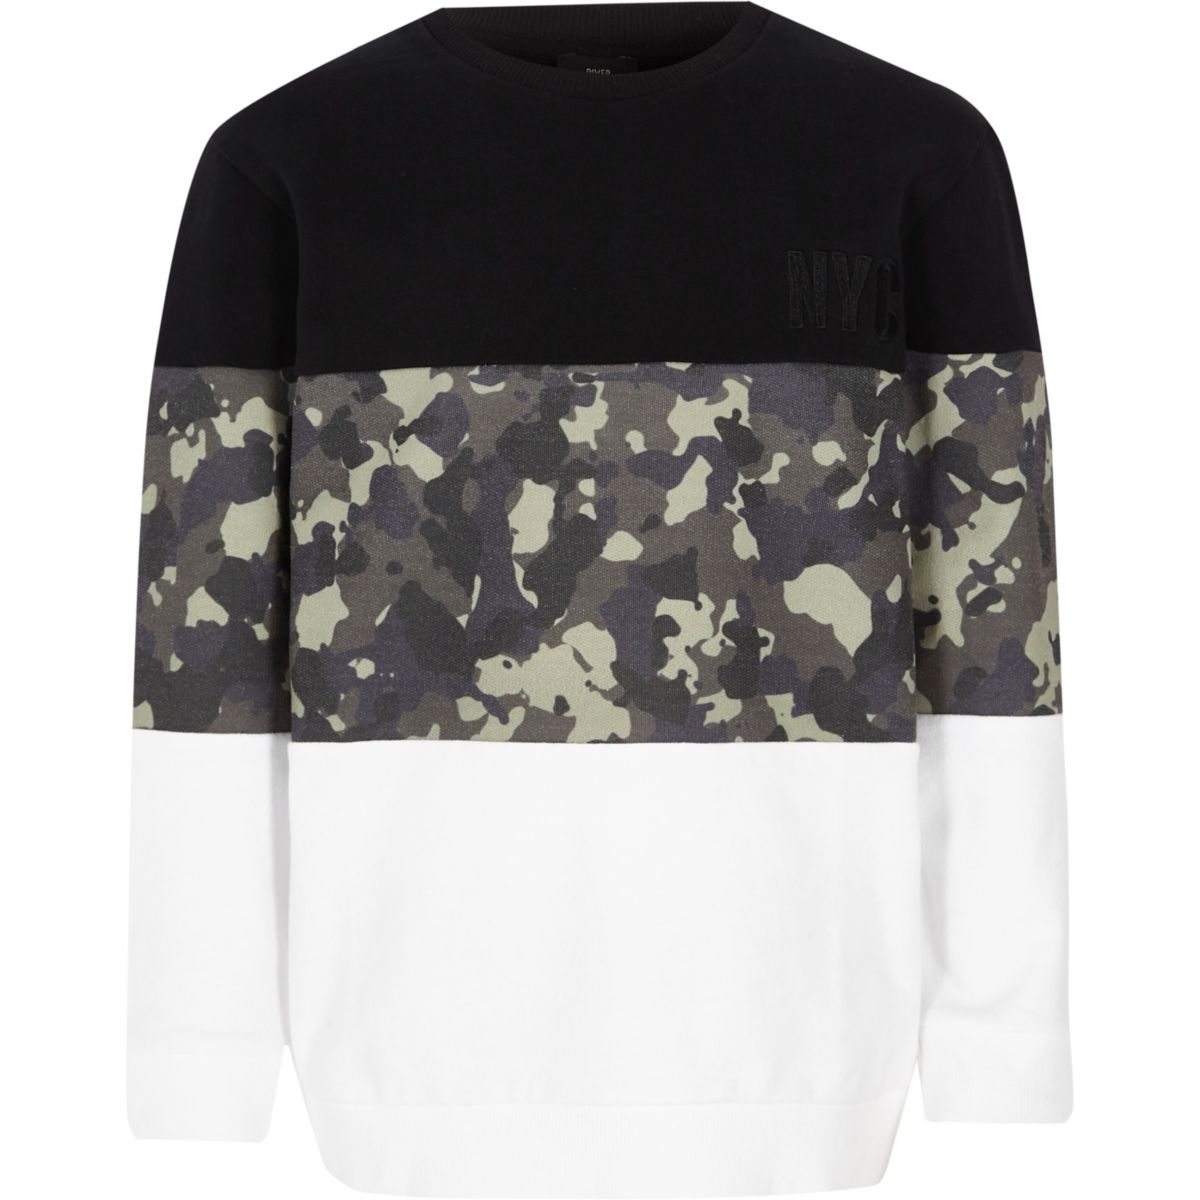 Boys black blocked camo print sweatshirt